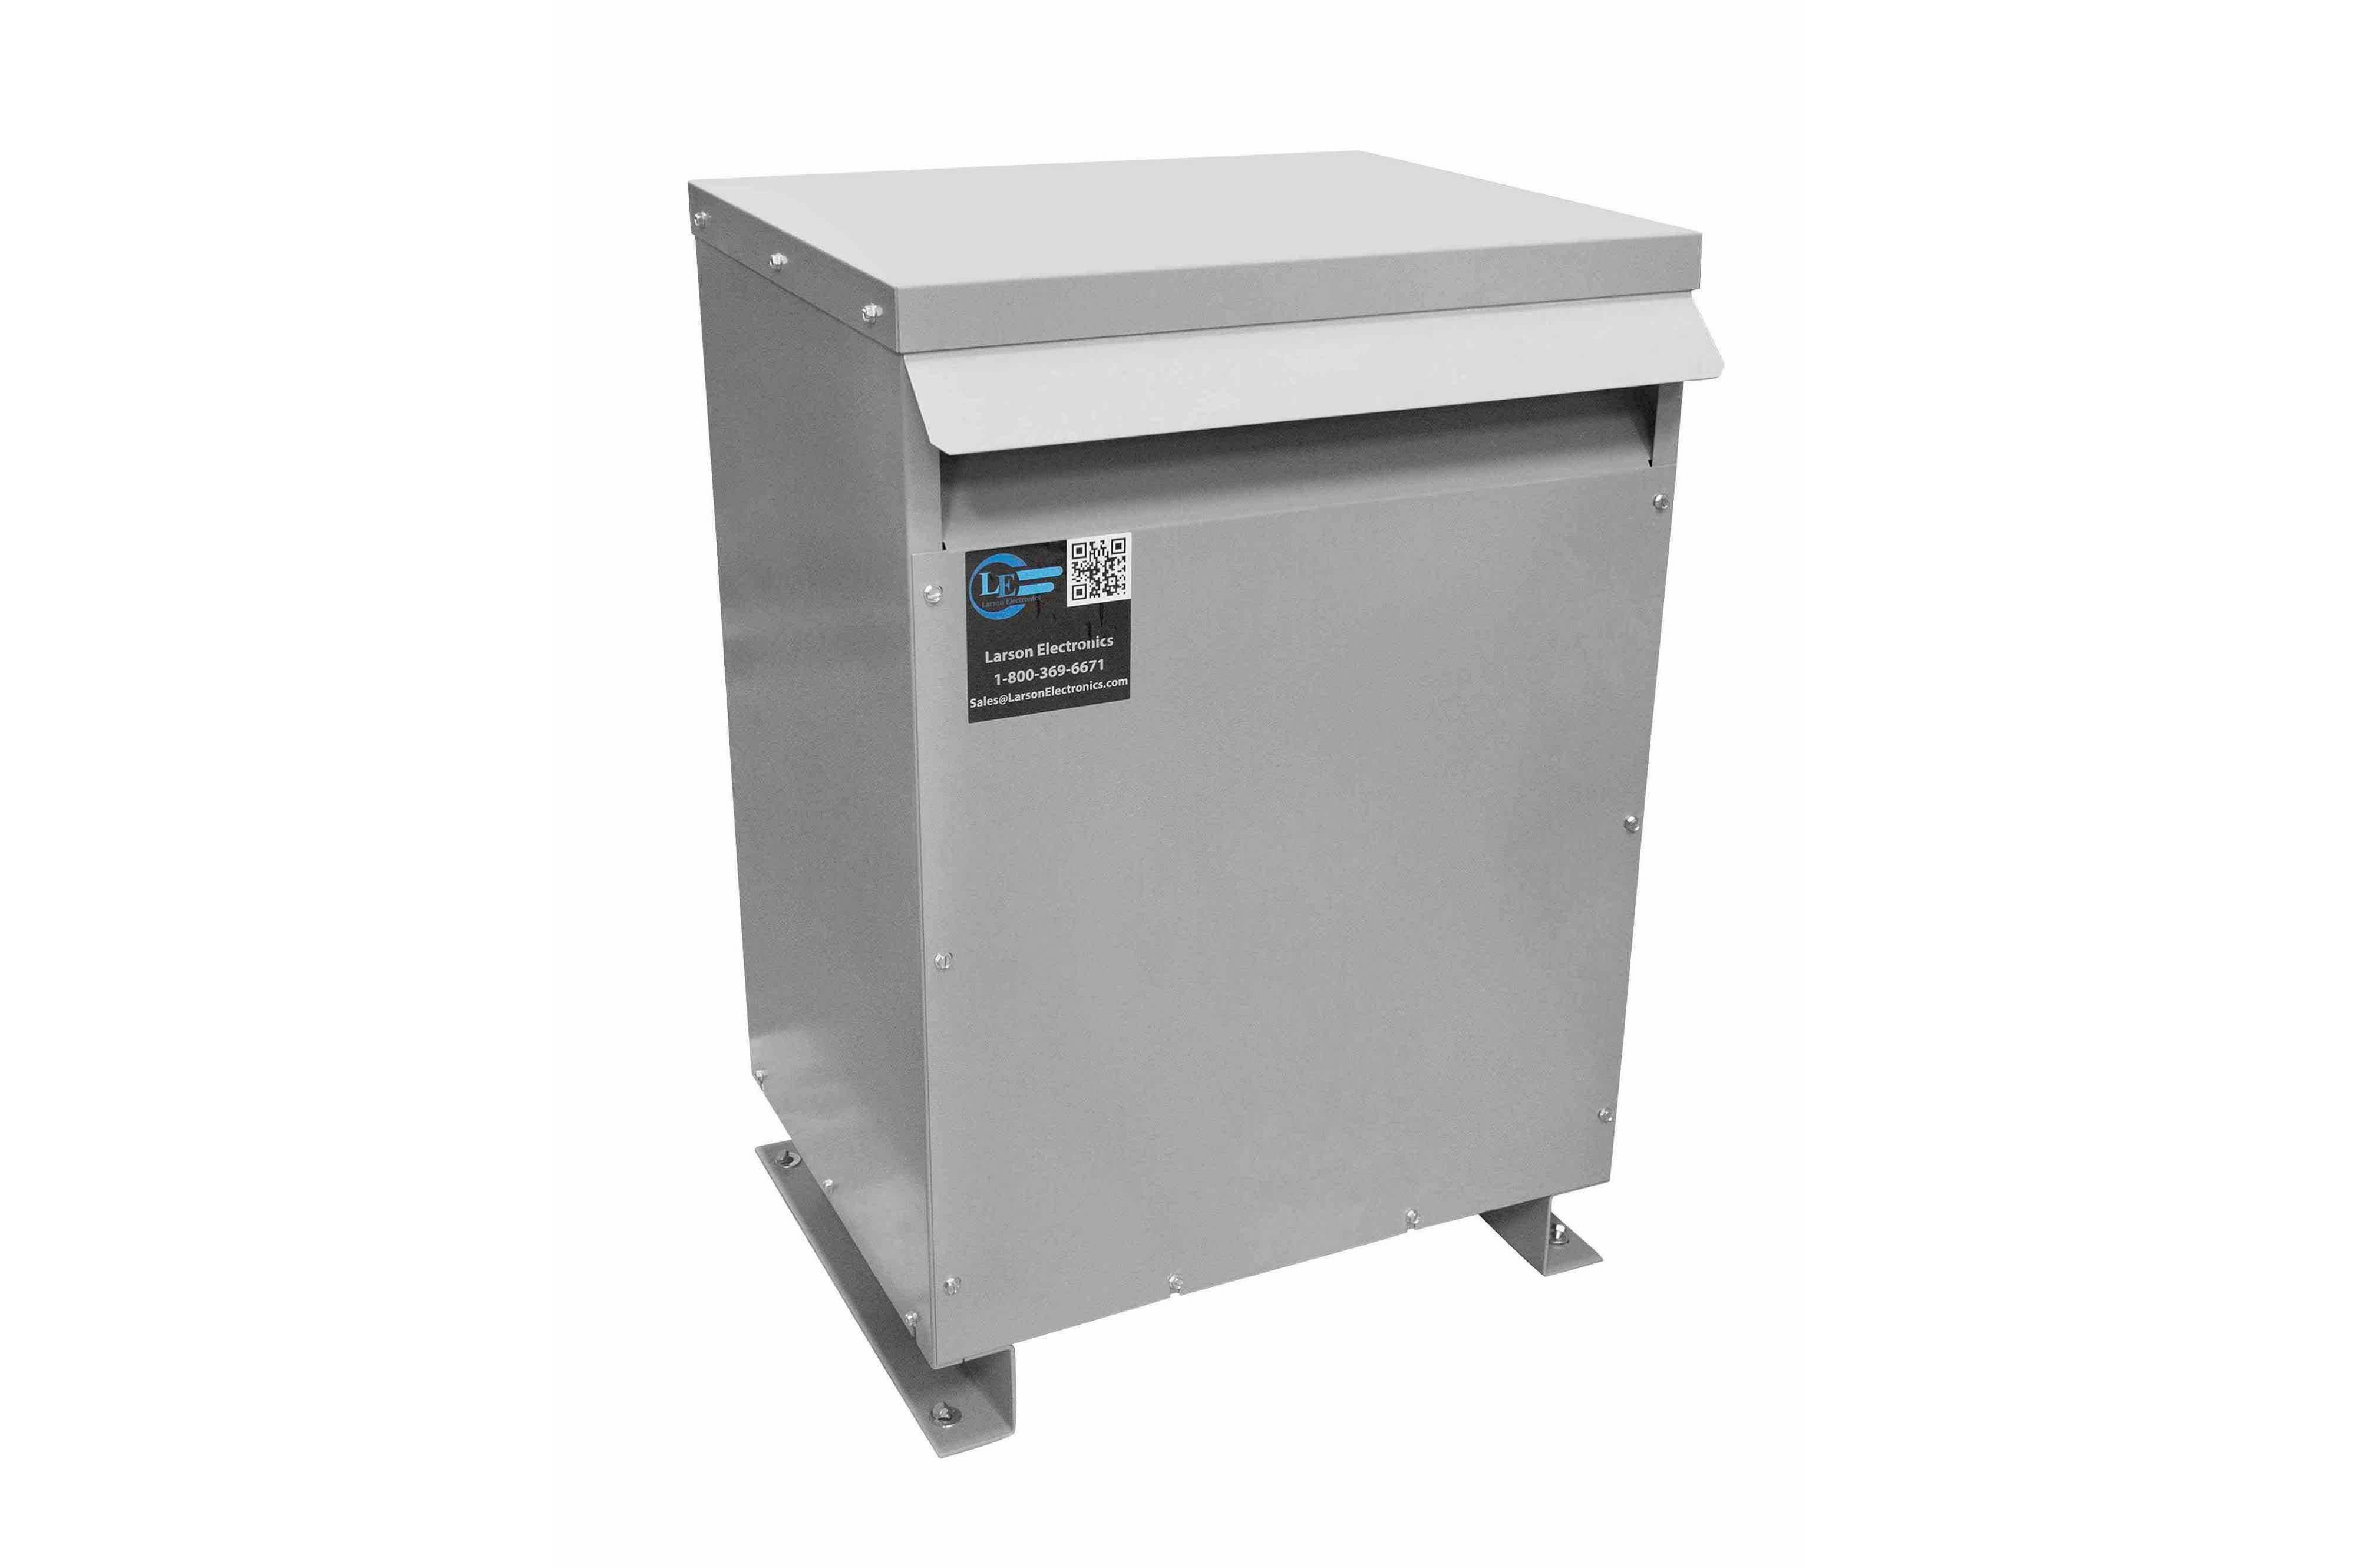 112.5 kVA 3PH Isolation Transformer, 480V Wye Primary, 480V Delta Secondary, N3R, Ventilated, 60 Hz